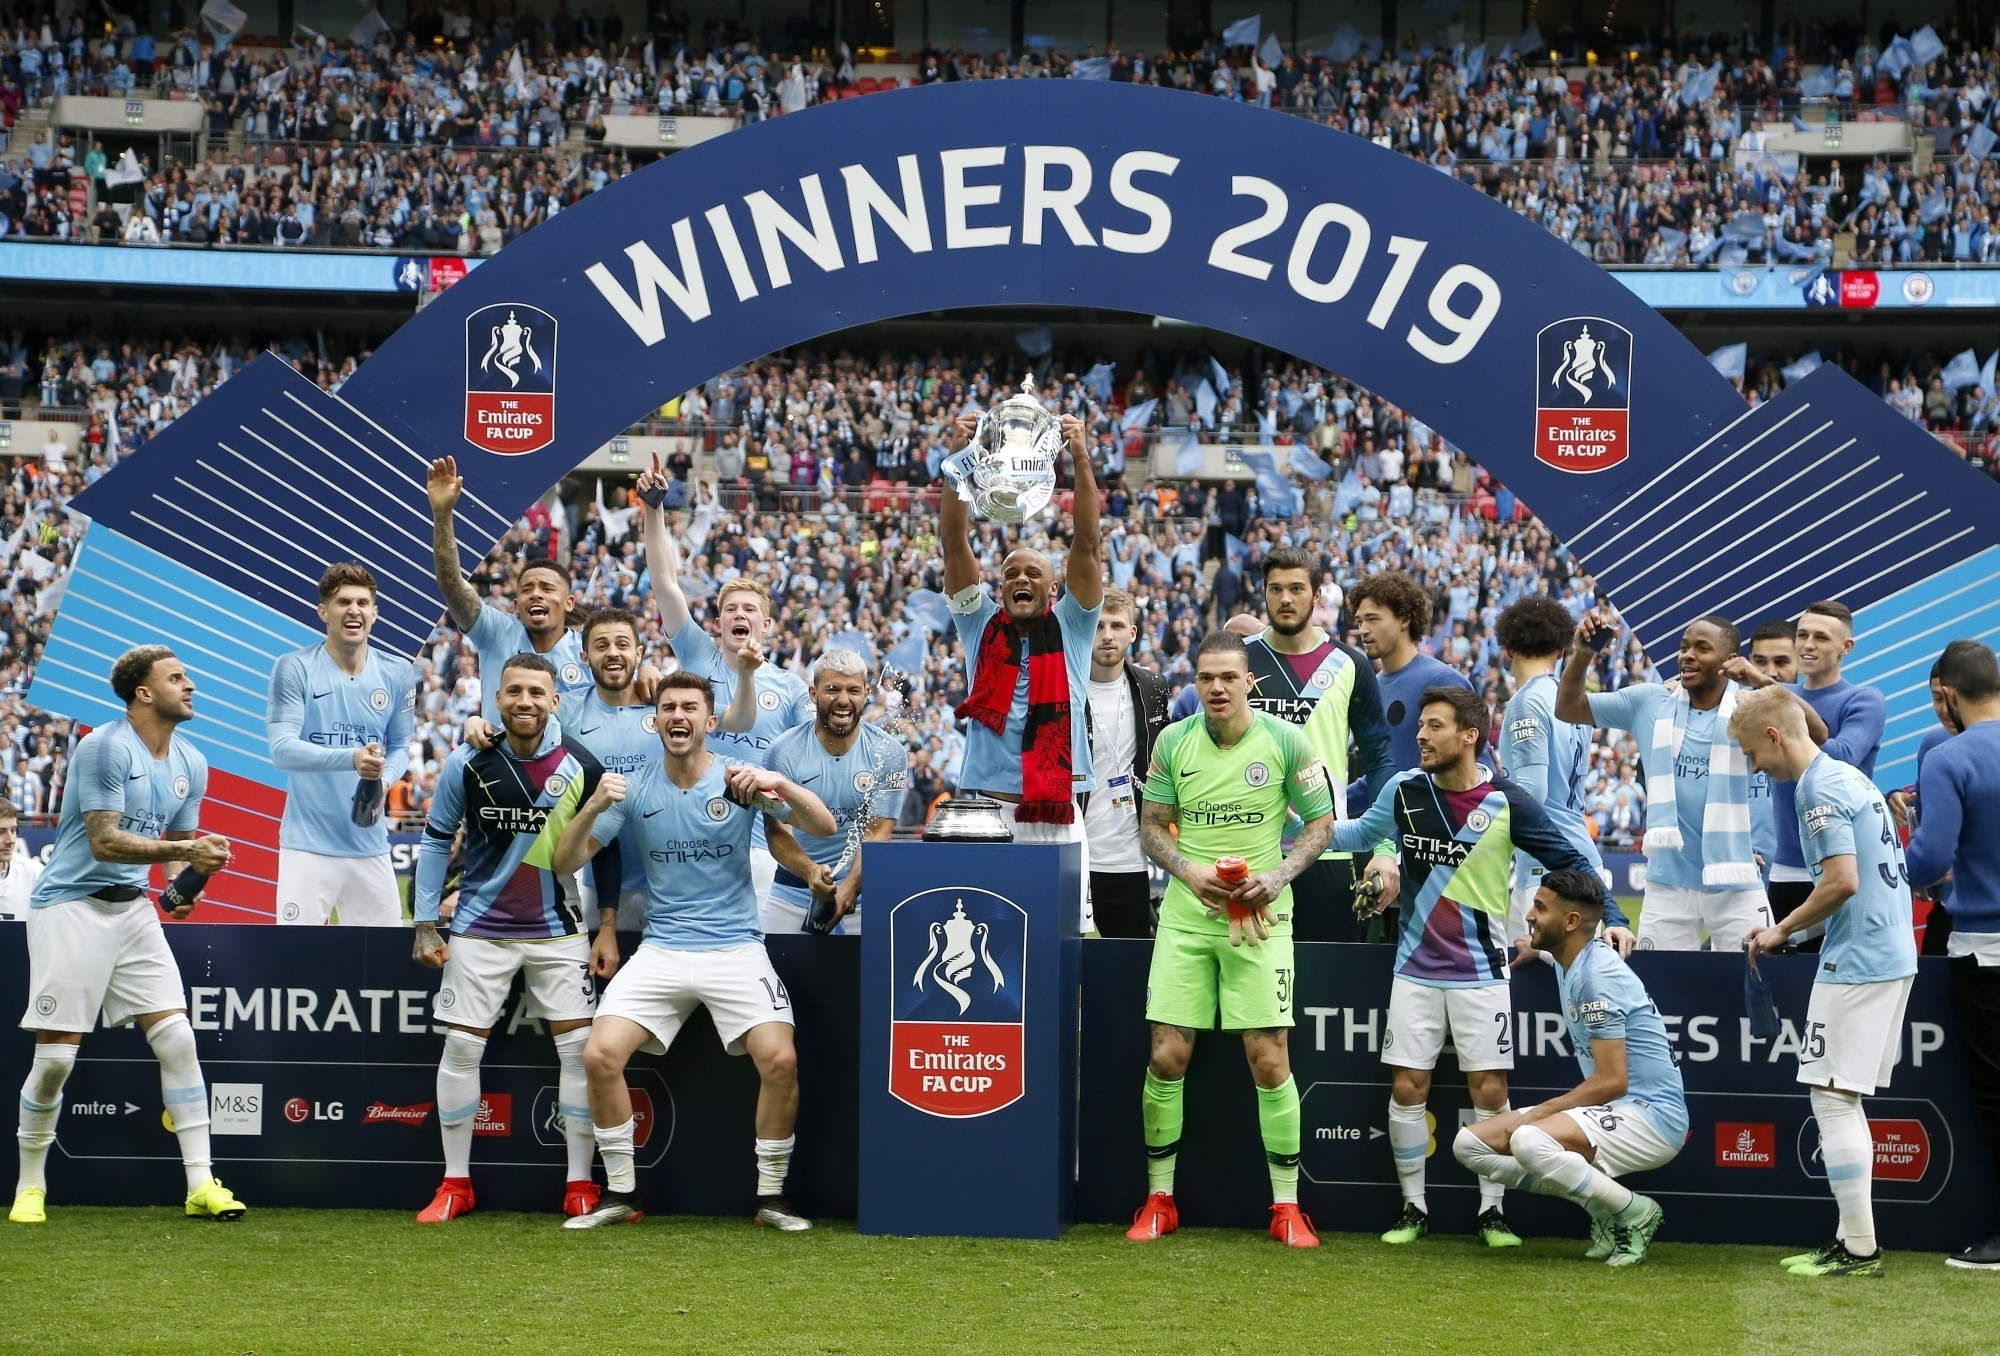 Man City Thrash Watford 6-0 to Complete Historic Treble